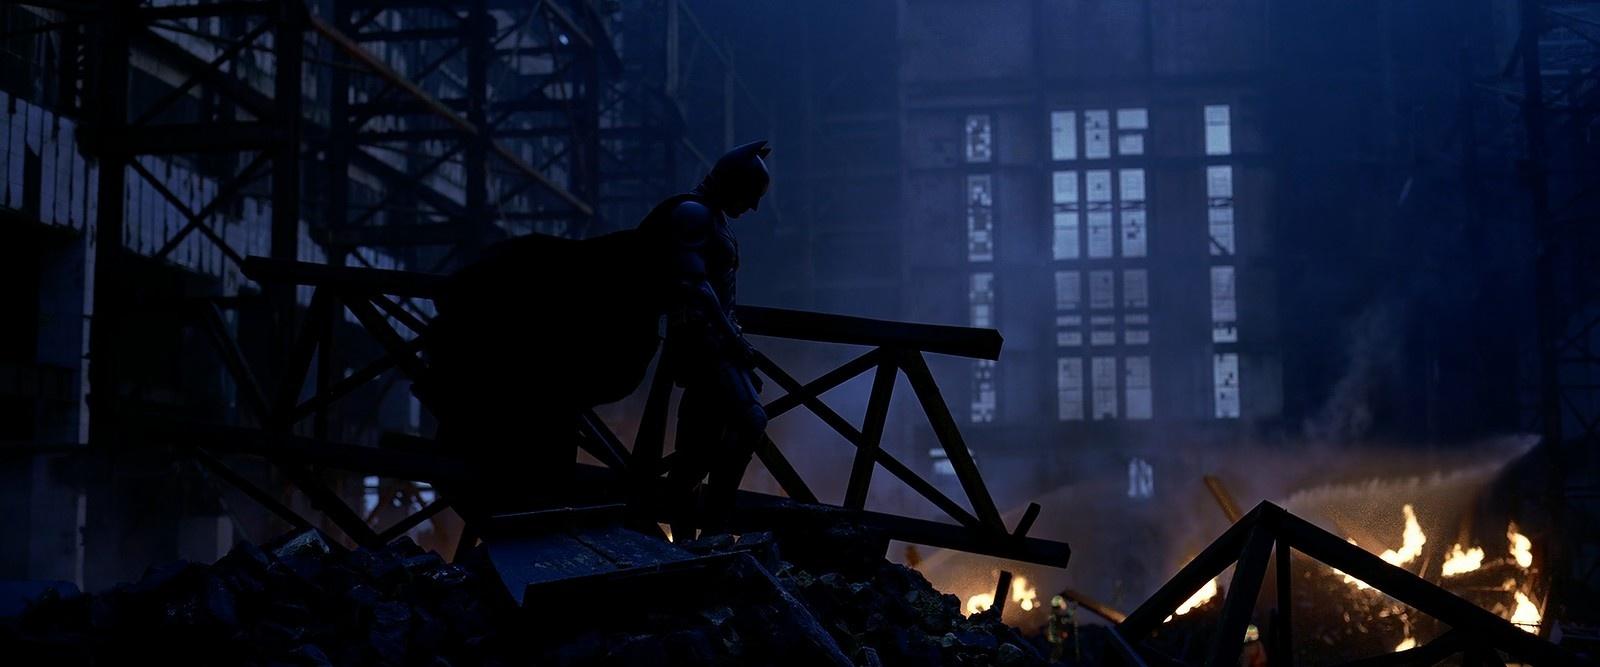 Galerie The Dark Knight : Le Chevalier noir 3